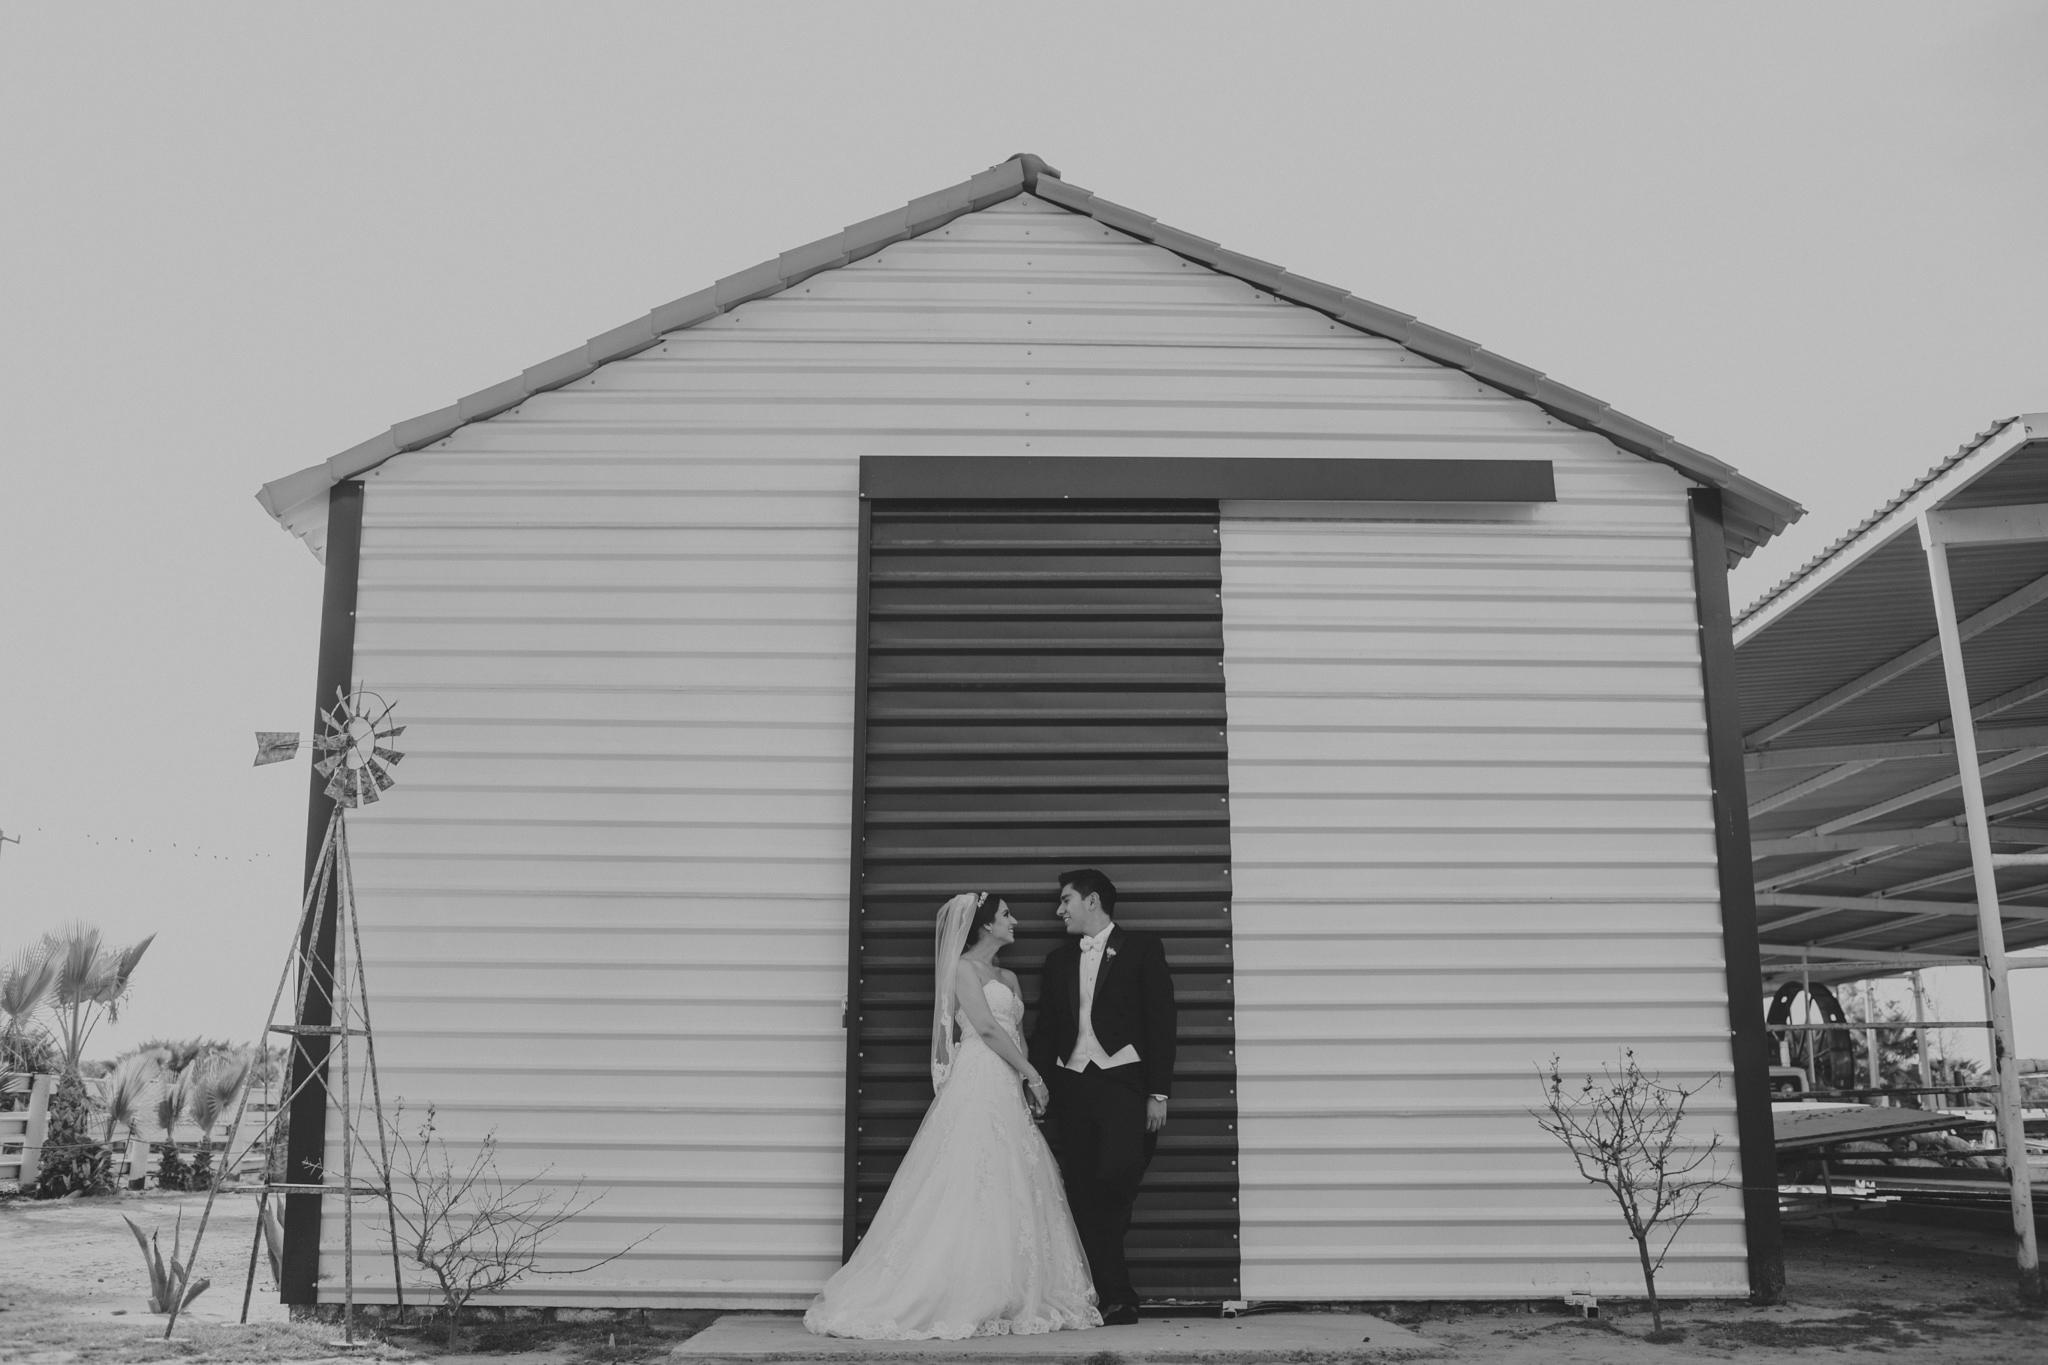 boda-en-torreon-armando-aragon-15